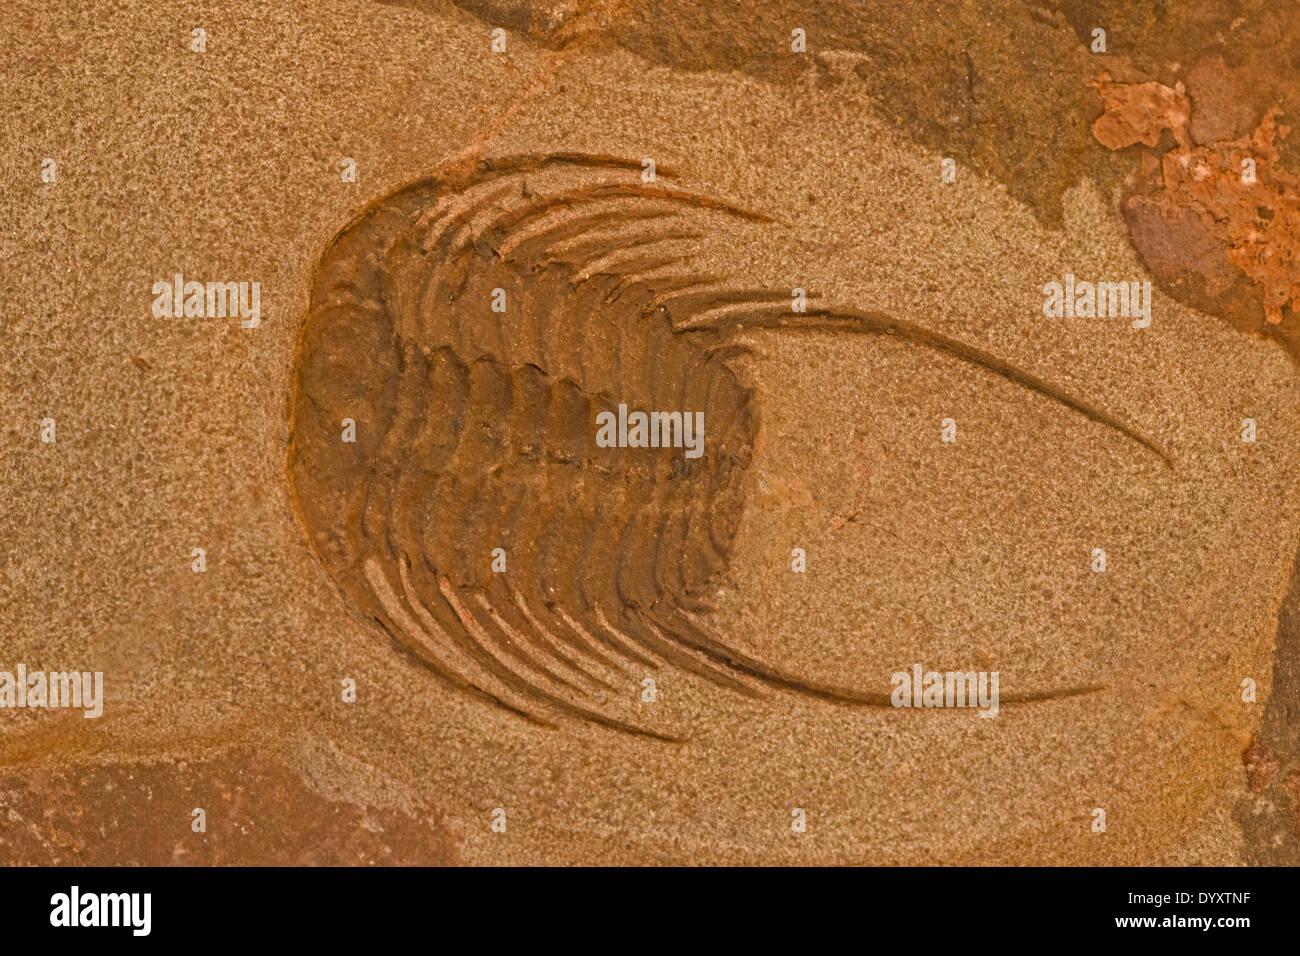 Trilobite, fossil of extinct marine invertebrate - Stock Image